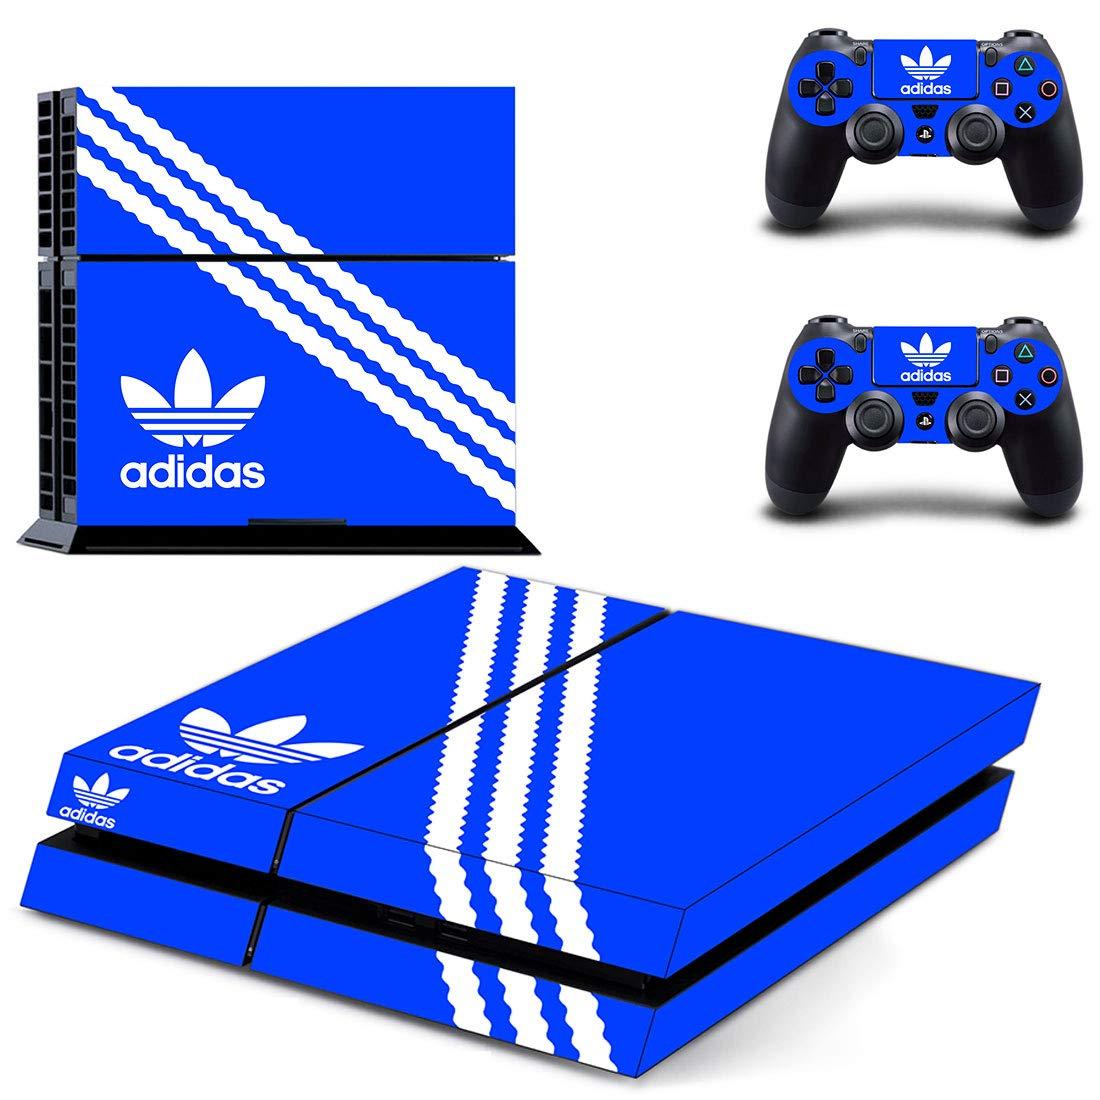 Adventure Games - PS4 ORIGINAL - Adidas, Blue - Playstation 4 Vinyl Console Skin Decal Sticker + 2 Controller Skins Set